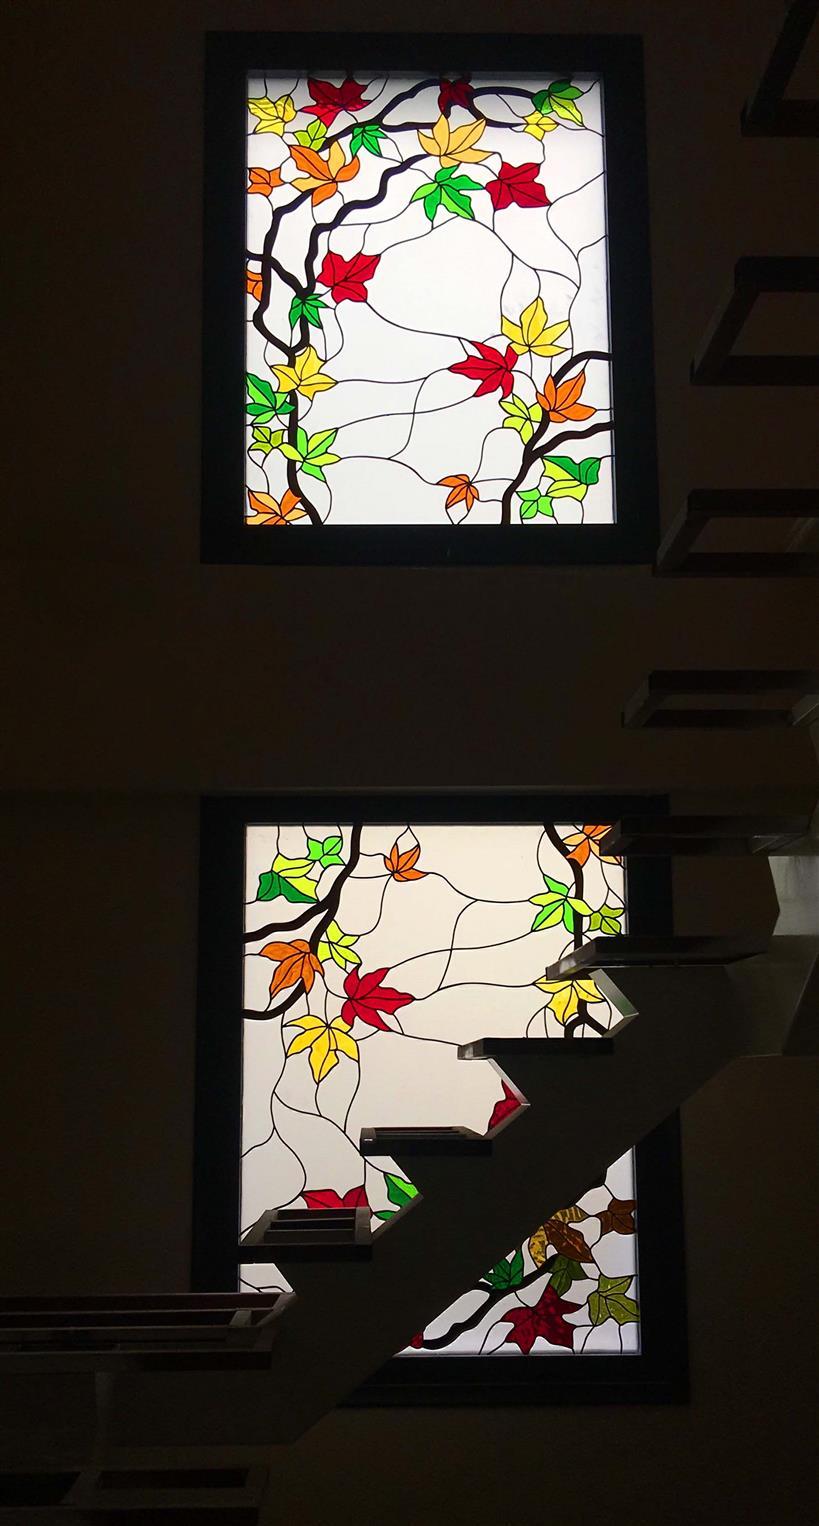 odemis-villa202012019550362.jpg izmir vitray çalışması